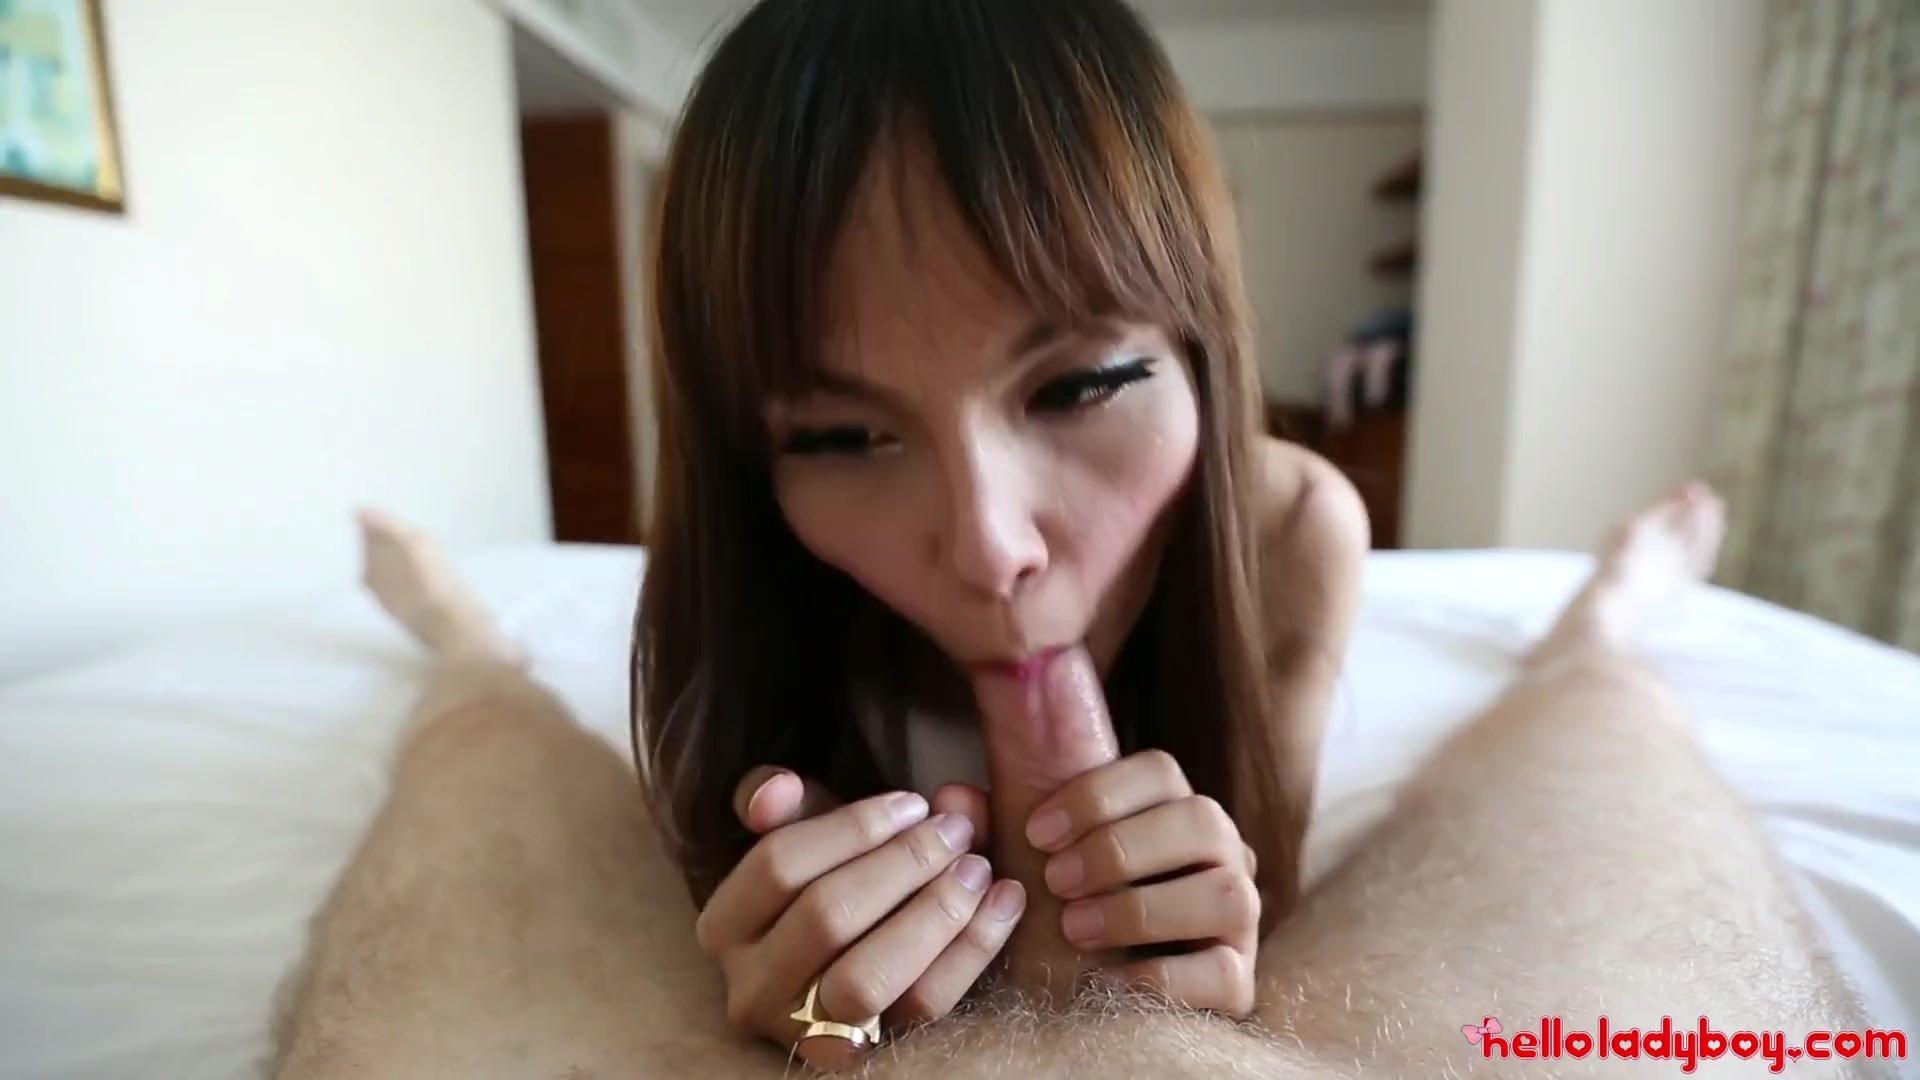 Hello LadyBoy - Thai ladyboy gets fucked by tourists big white cock